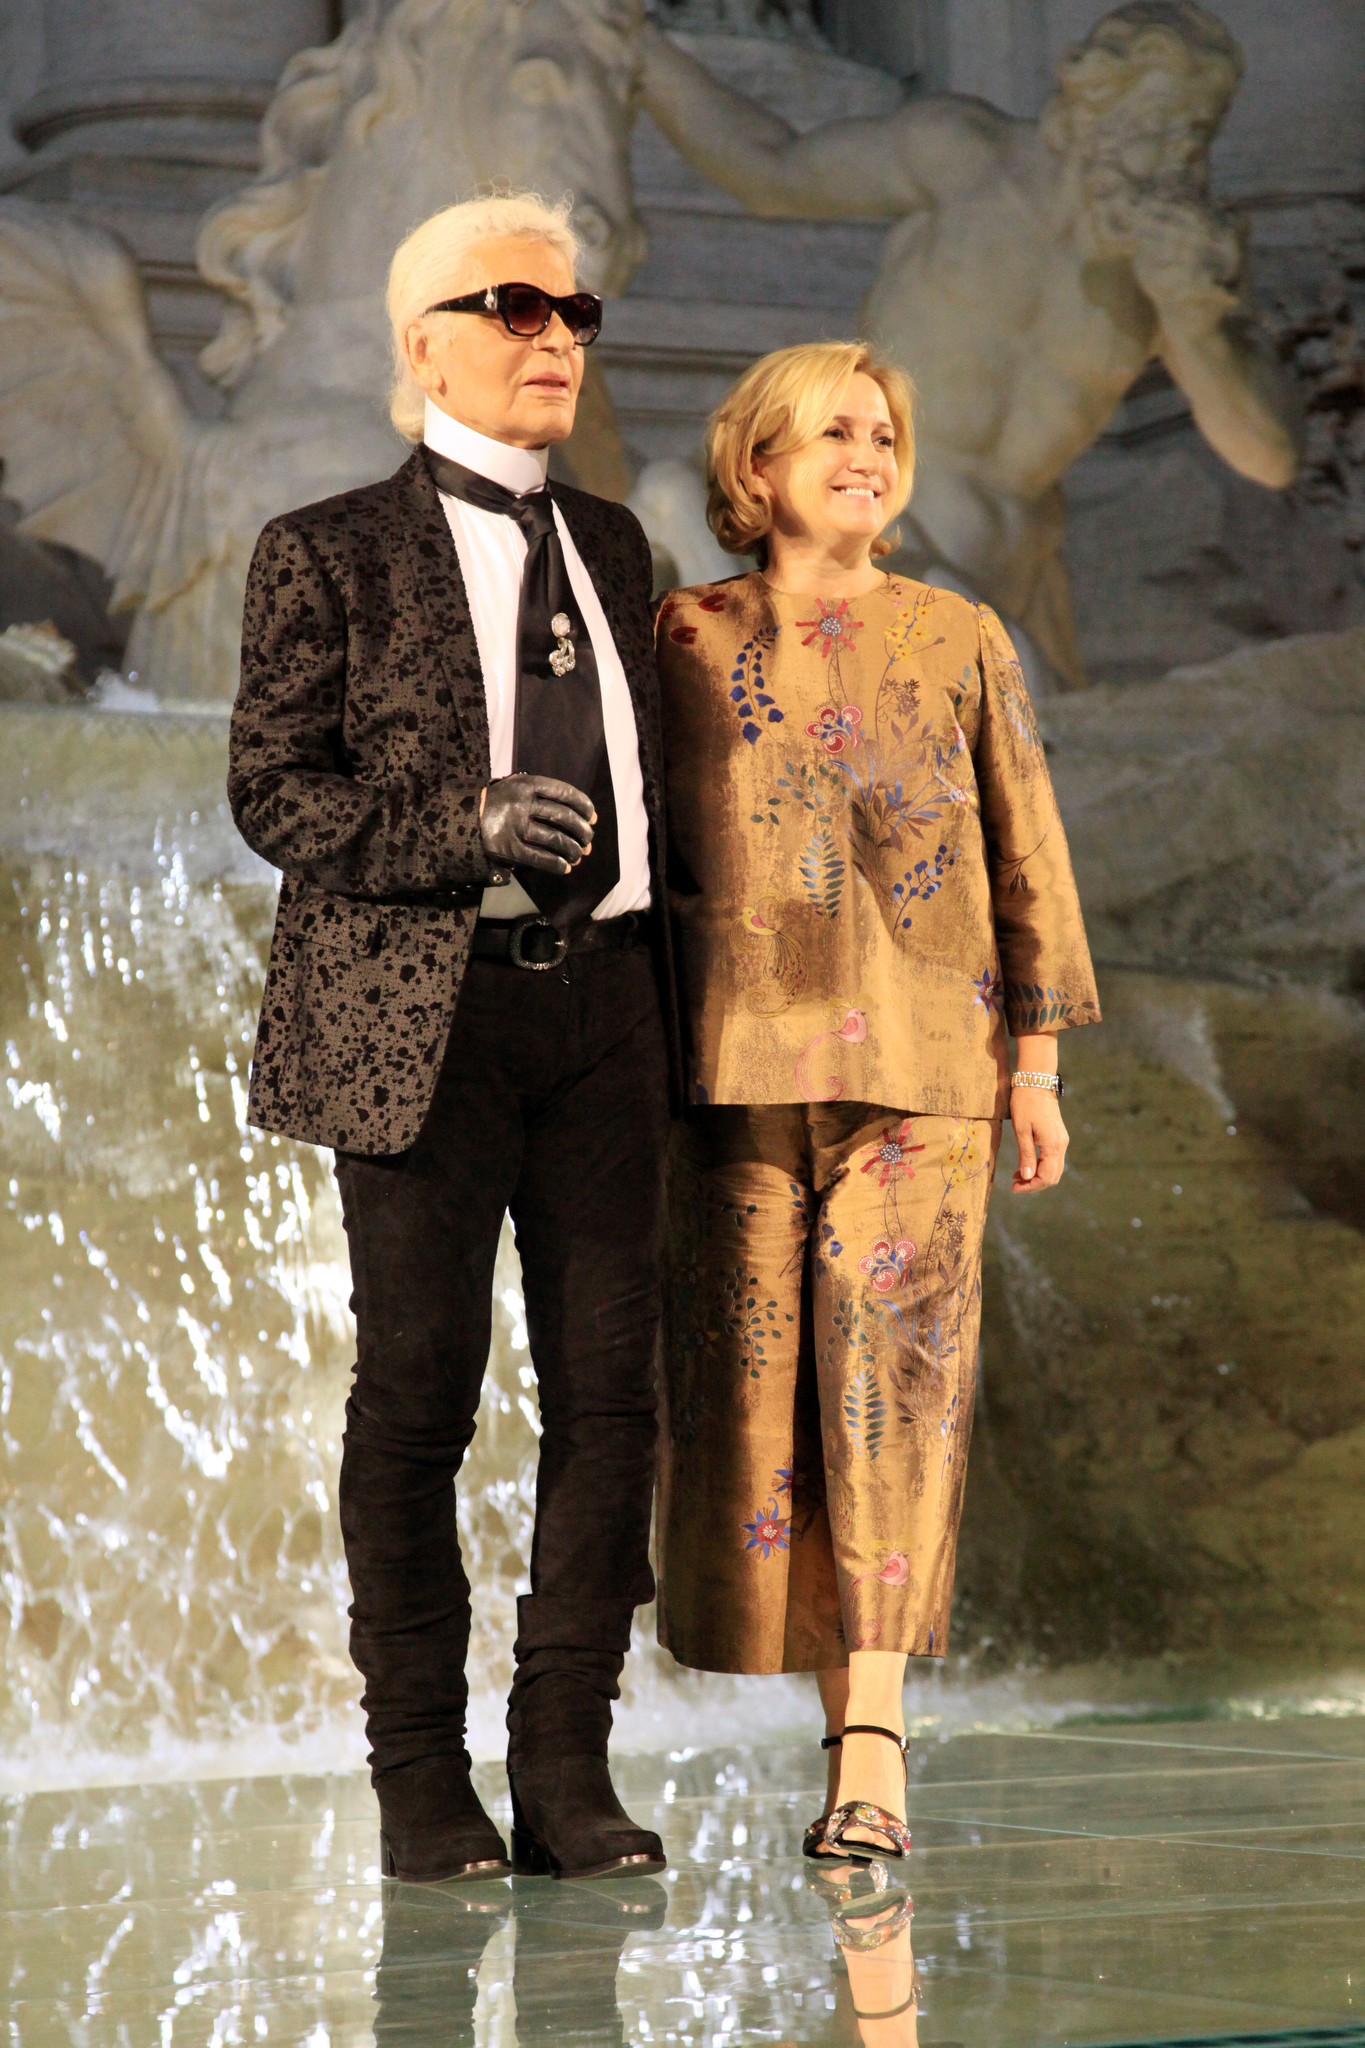 Karl Lagerfeld and Silvia Venturini Fendi on the catwalk